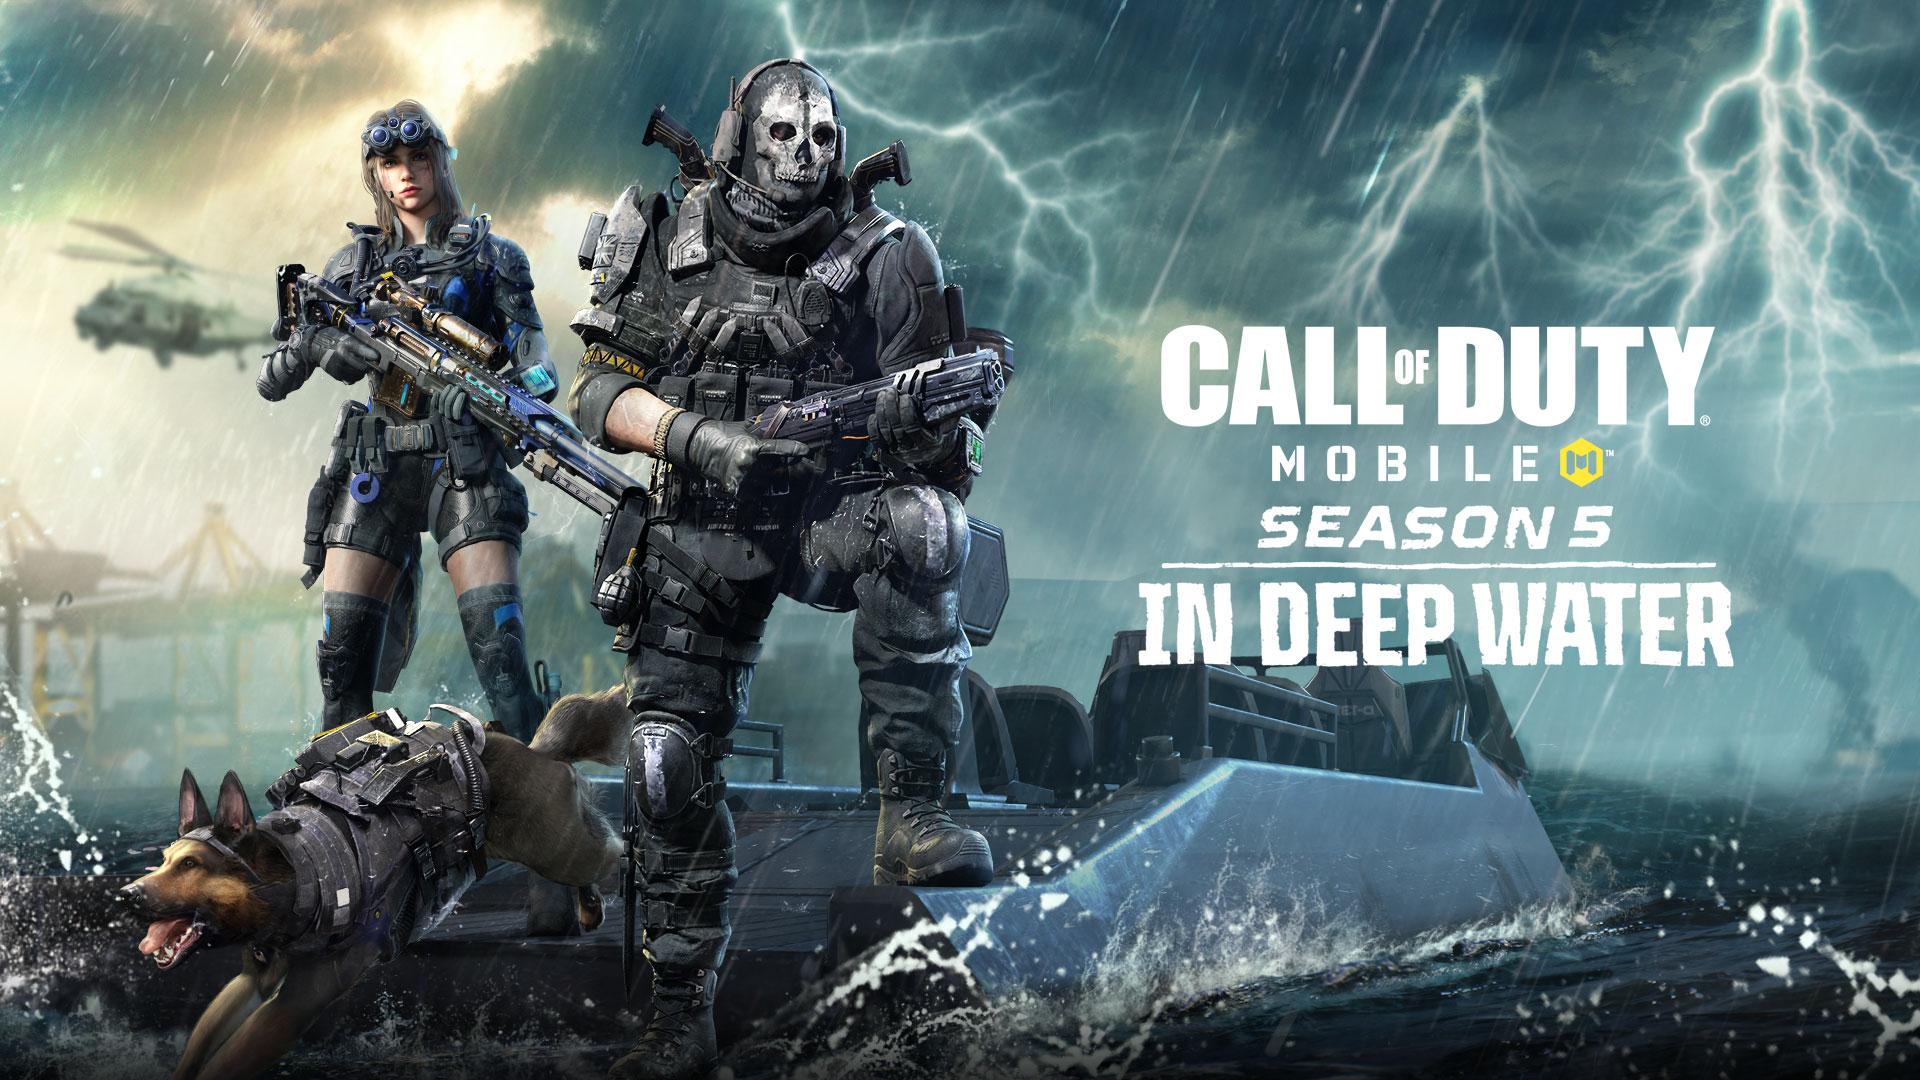 CODM Season 5